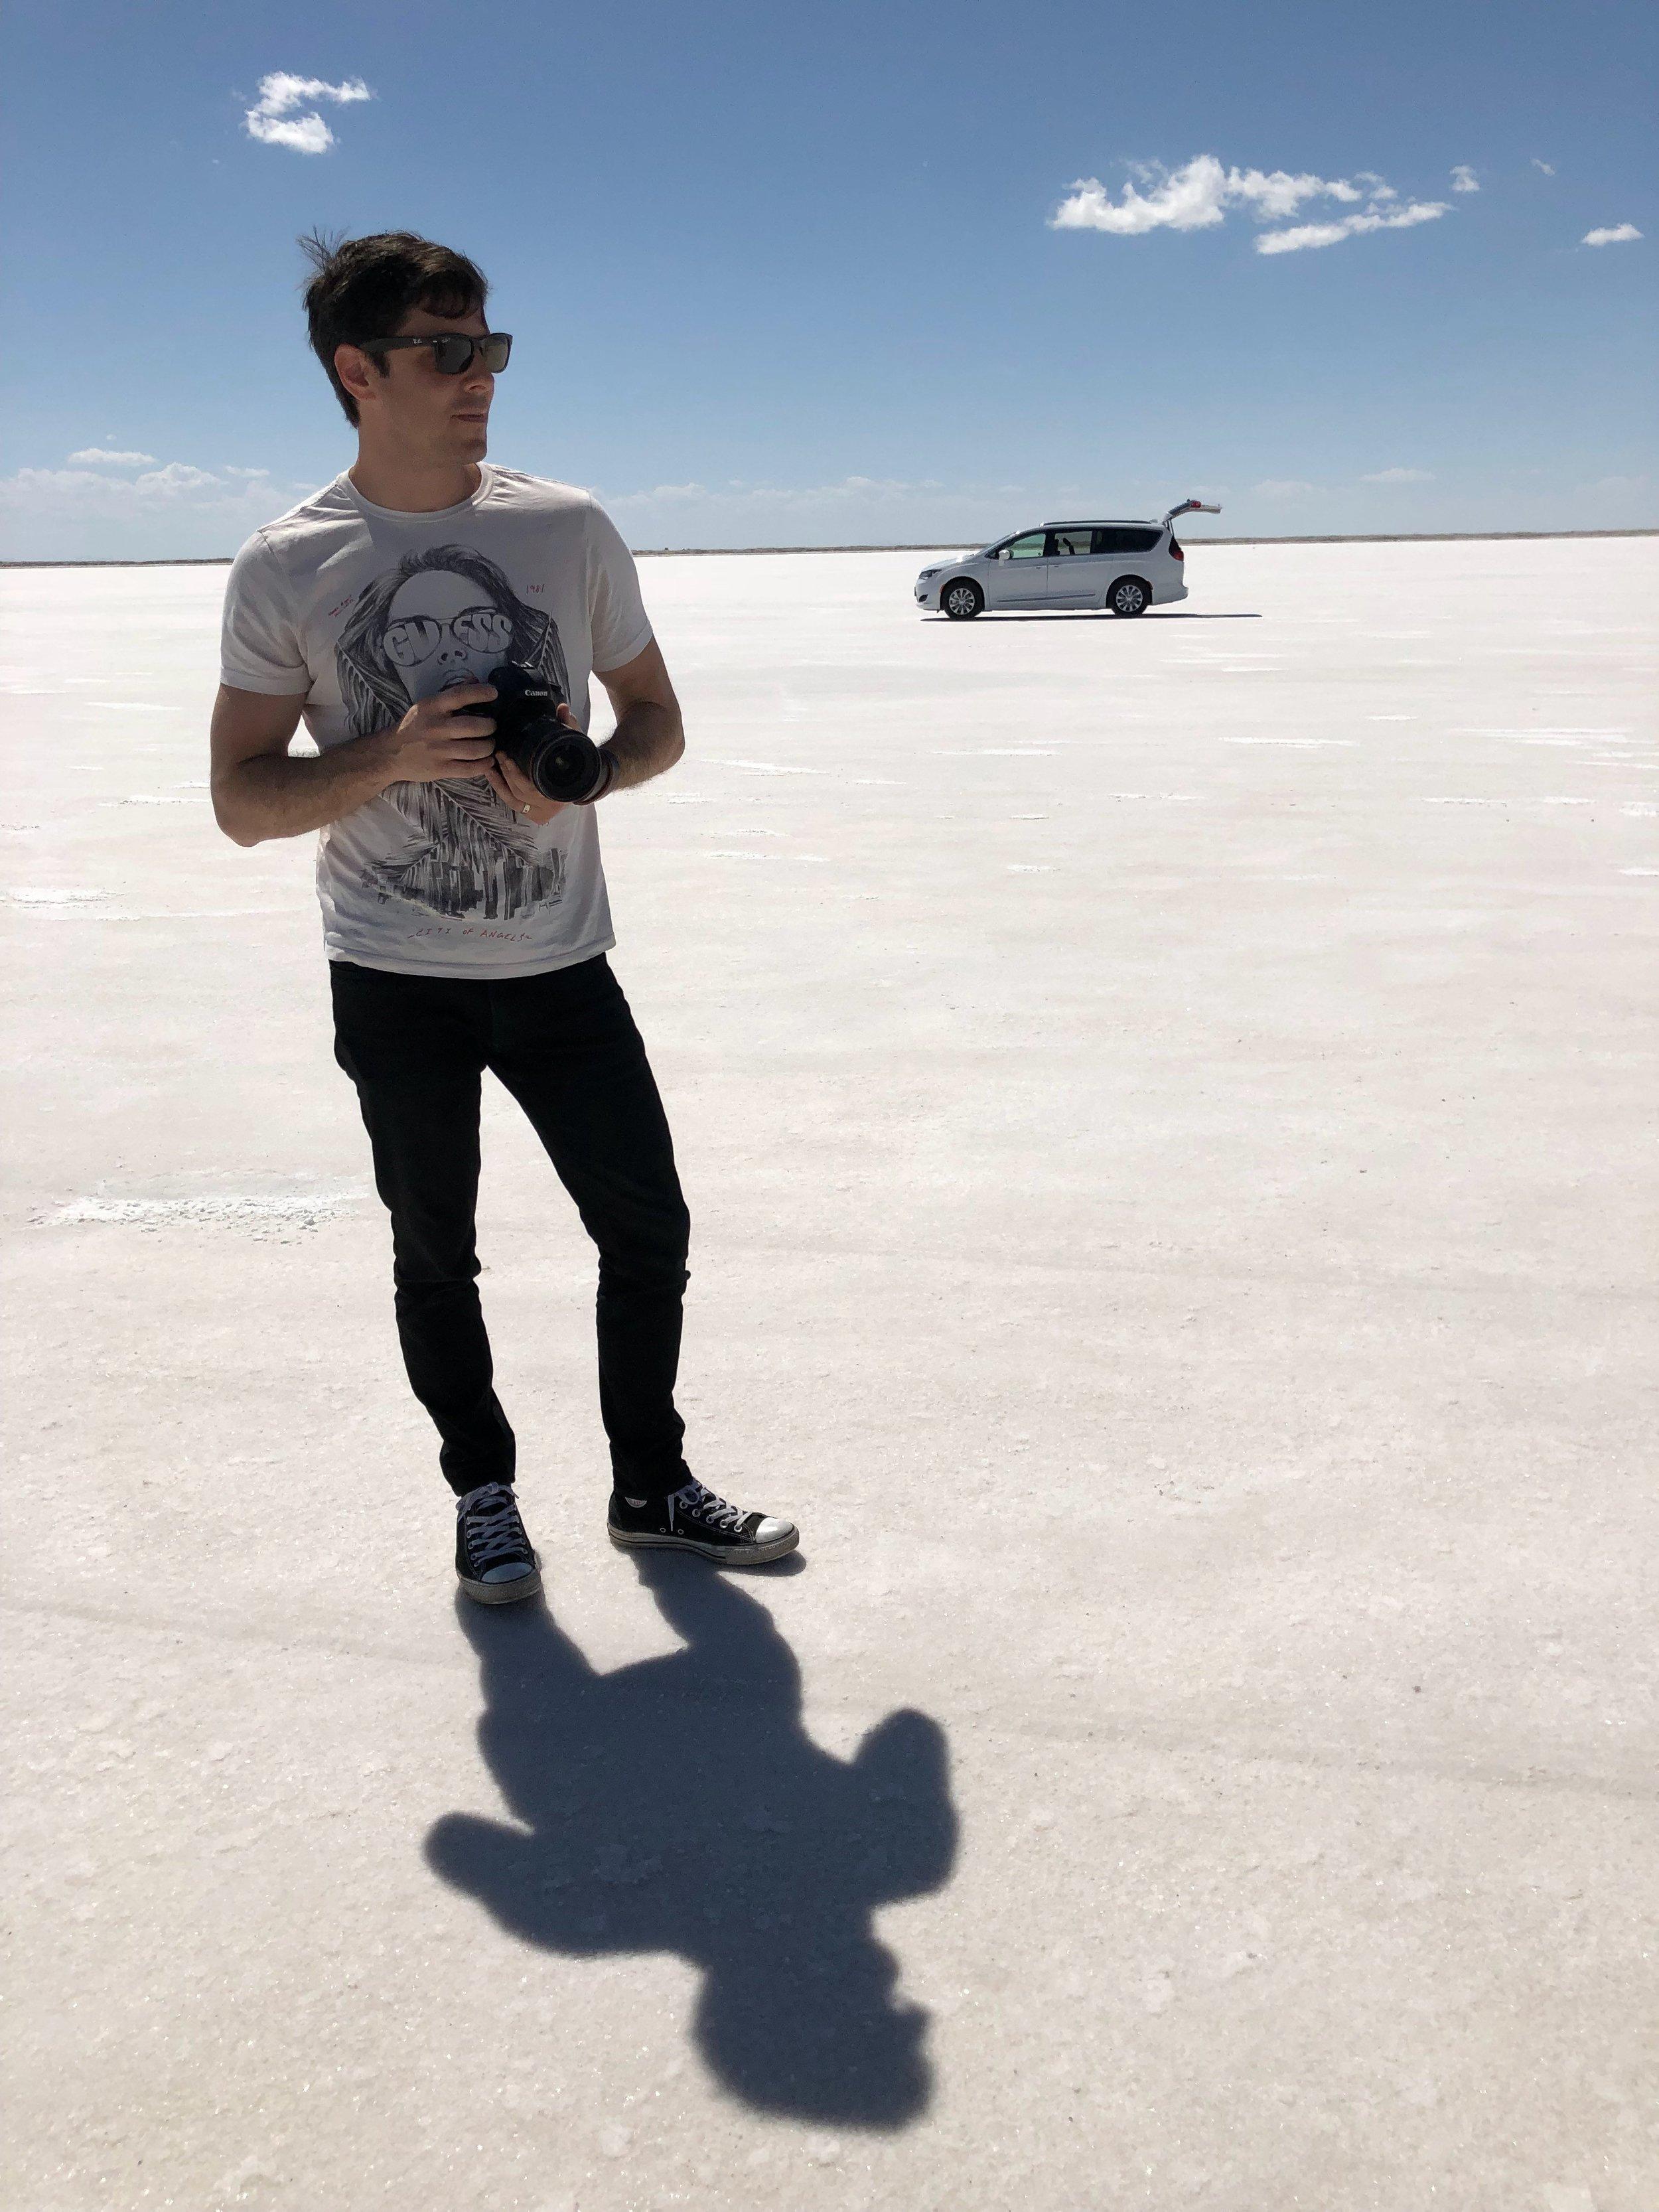 Somewhere at Bonneville Salt Flats